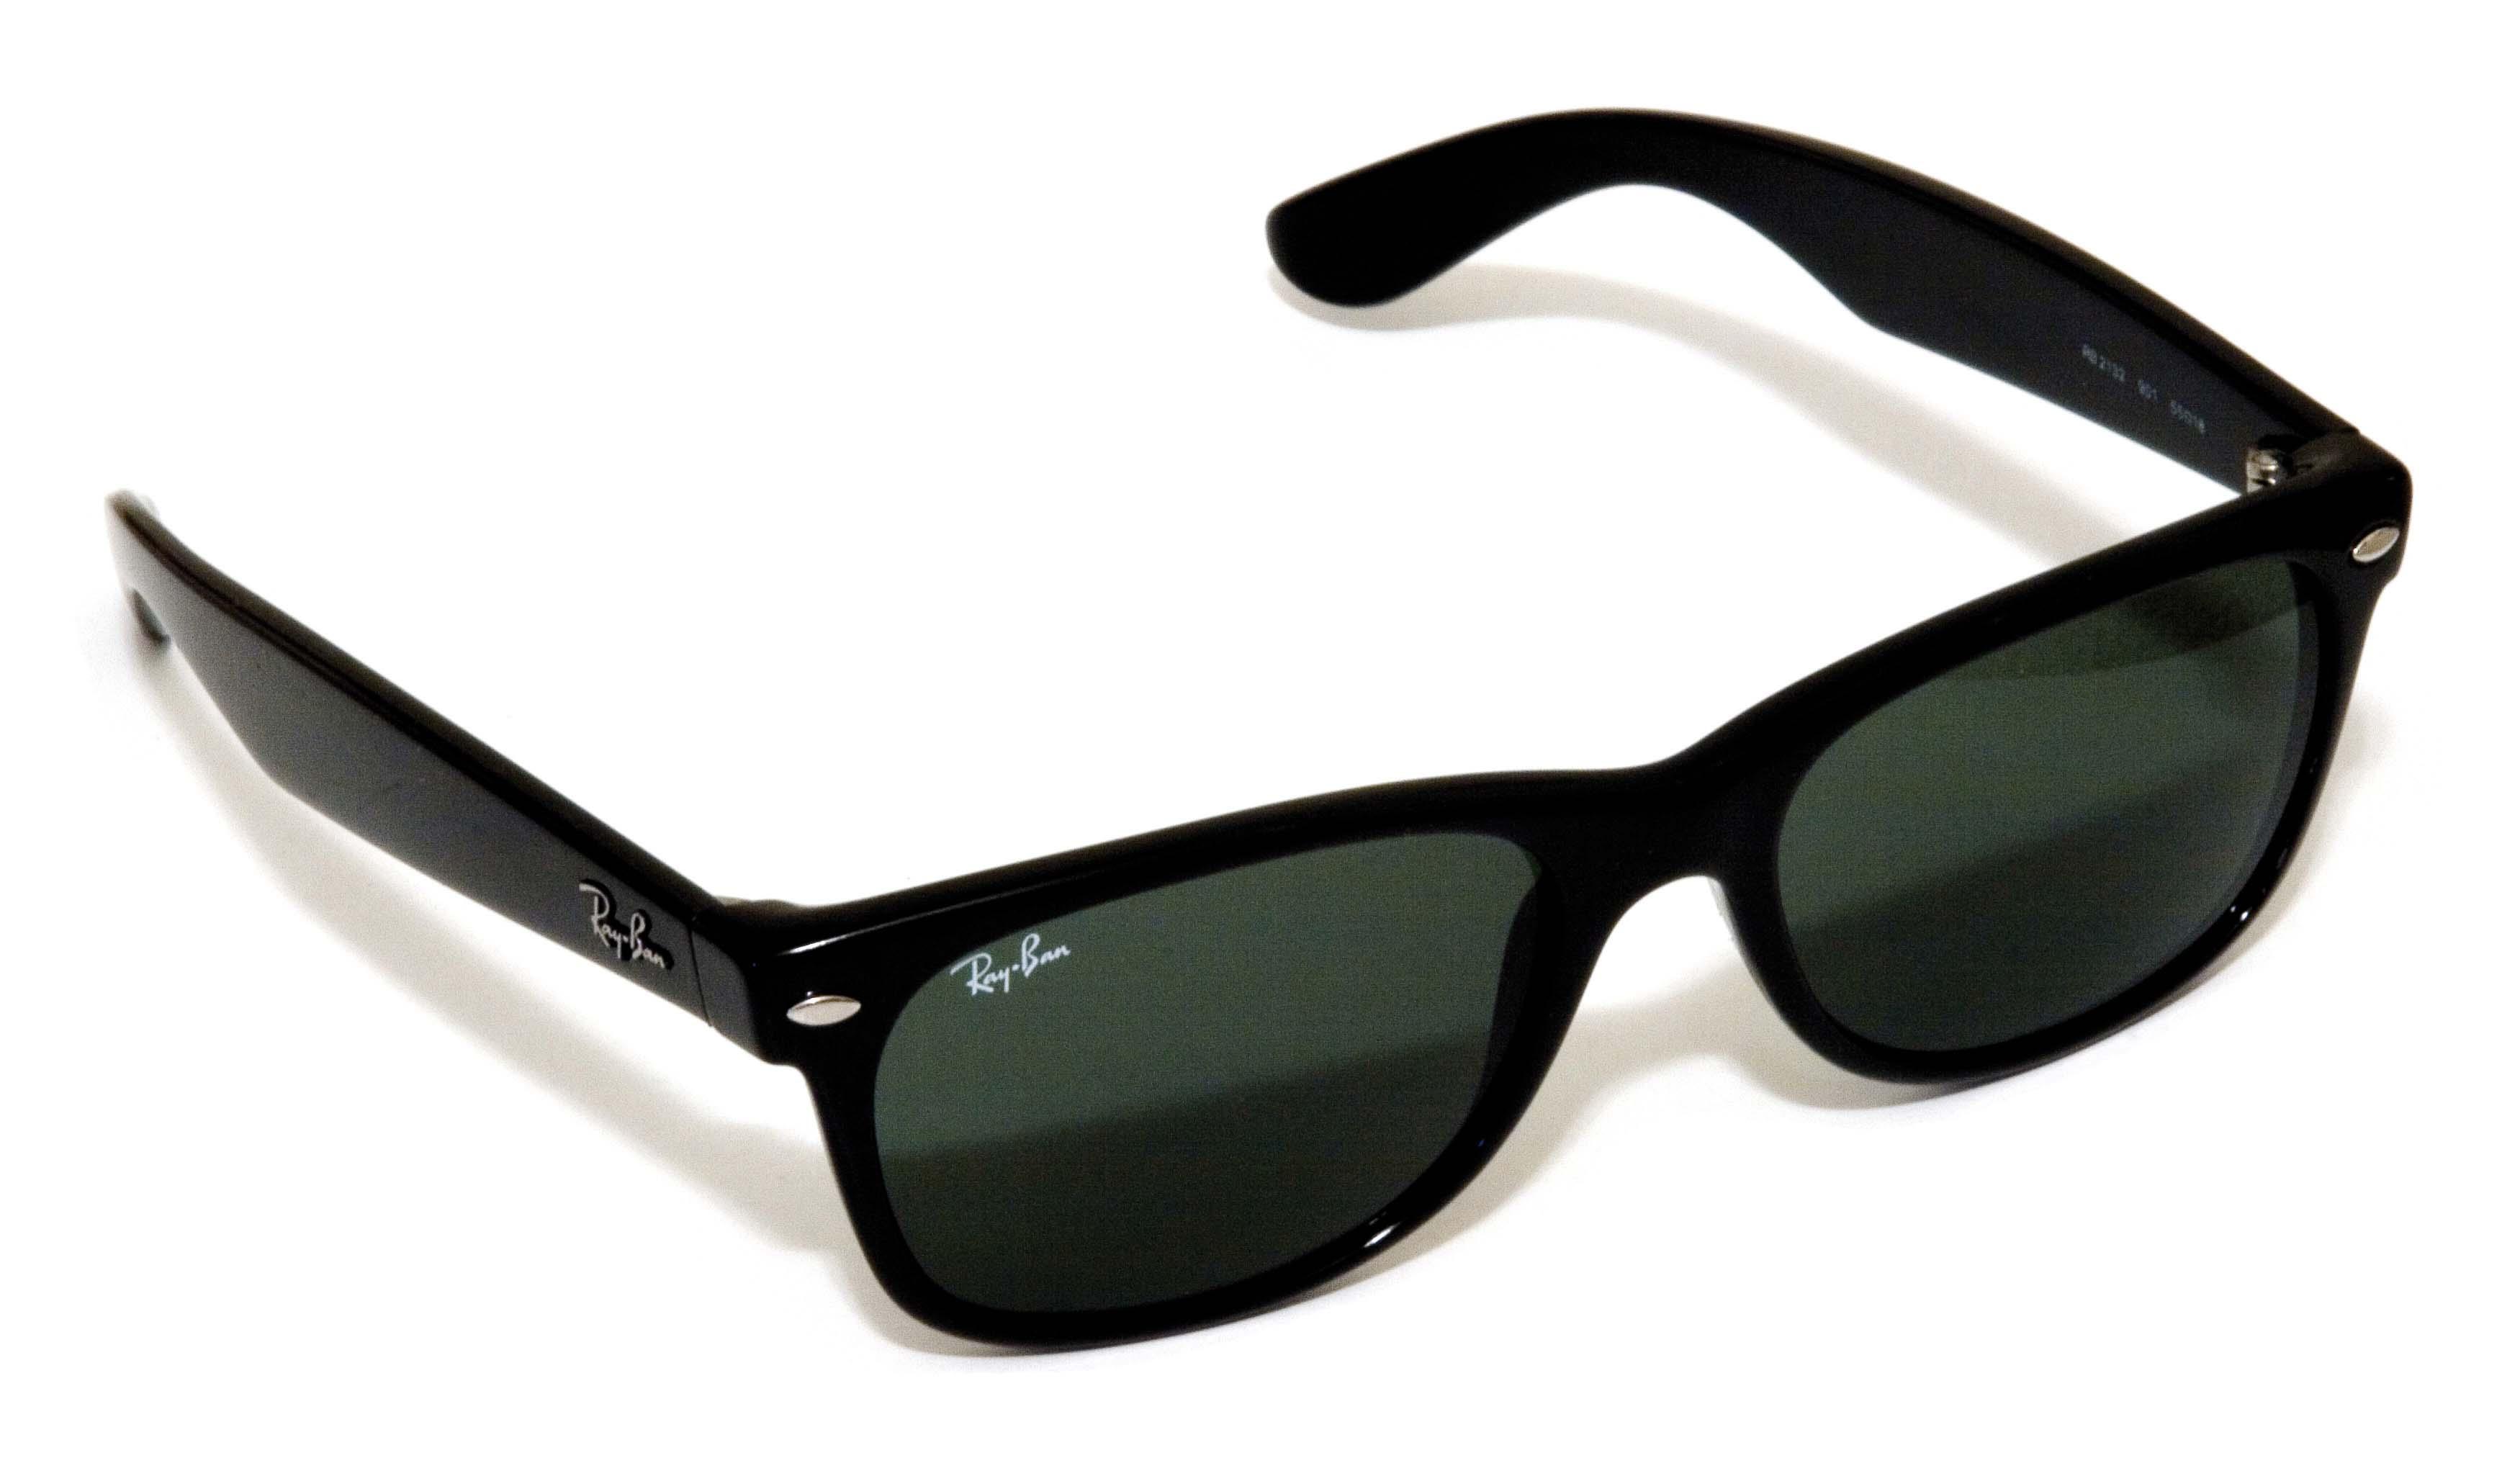 Ray ban sunglasses sale new zealand - Ray Ban Justin Nz